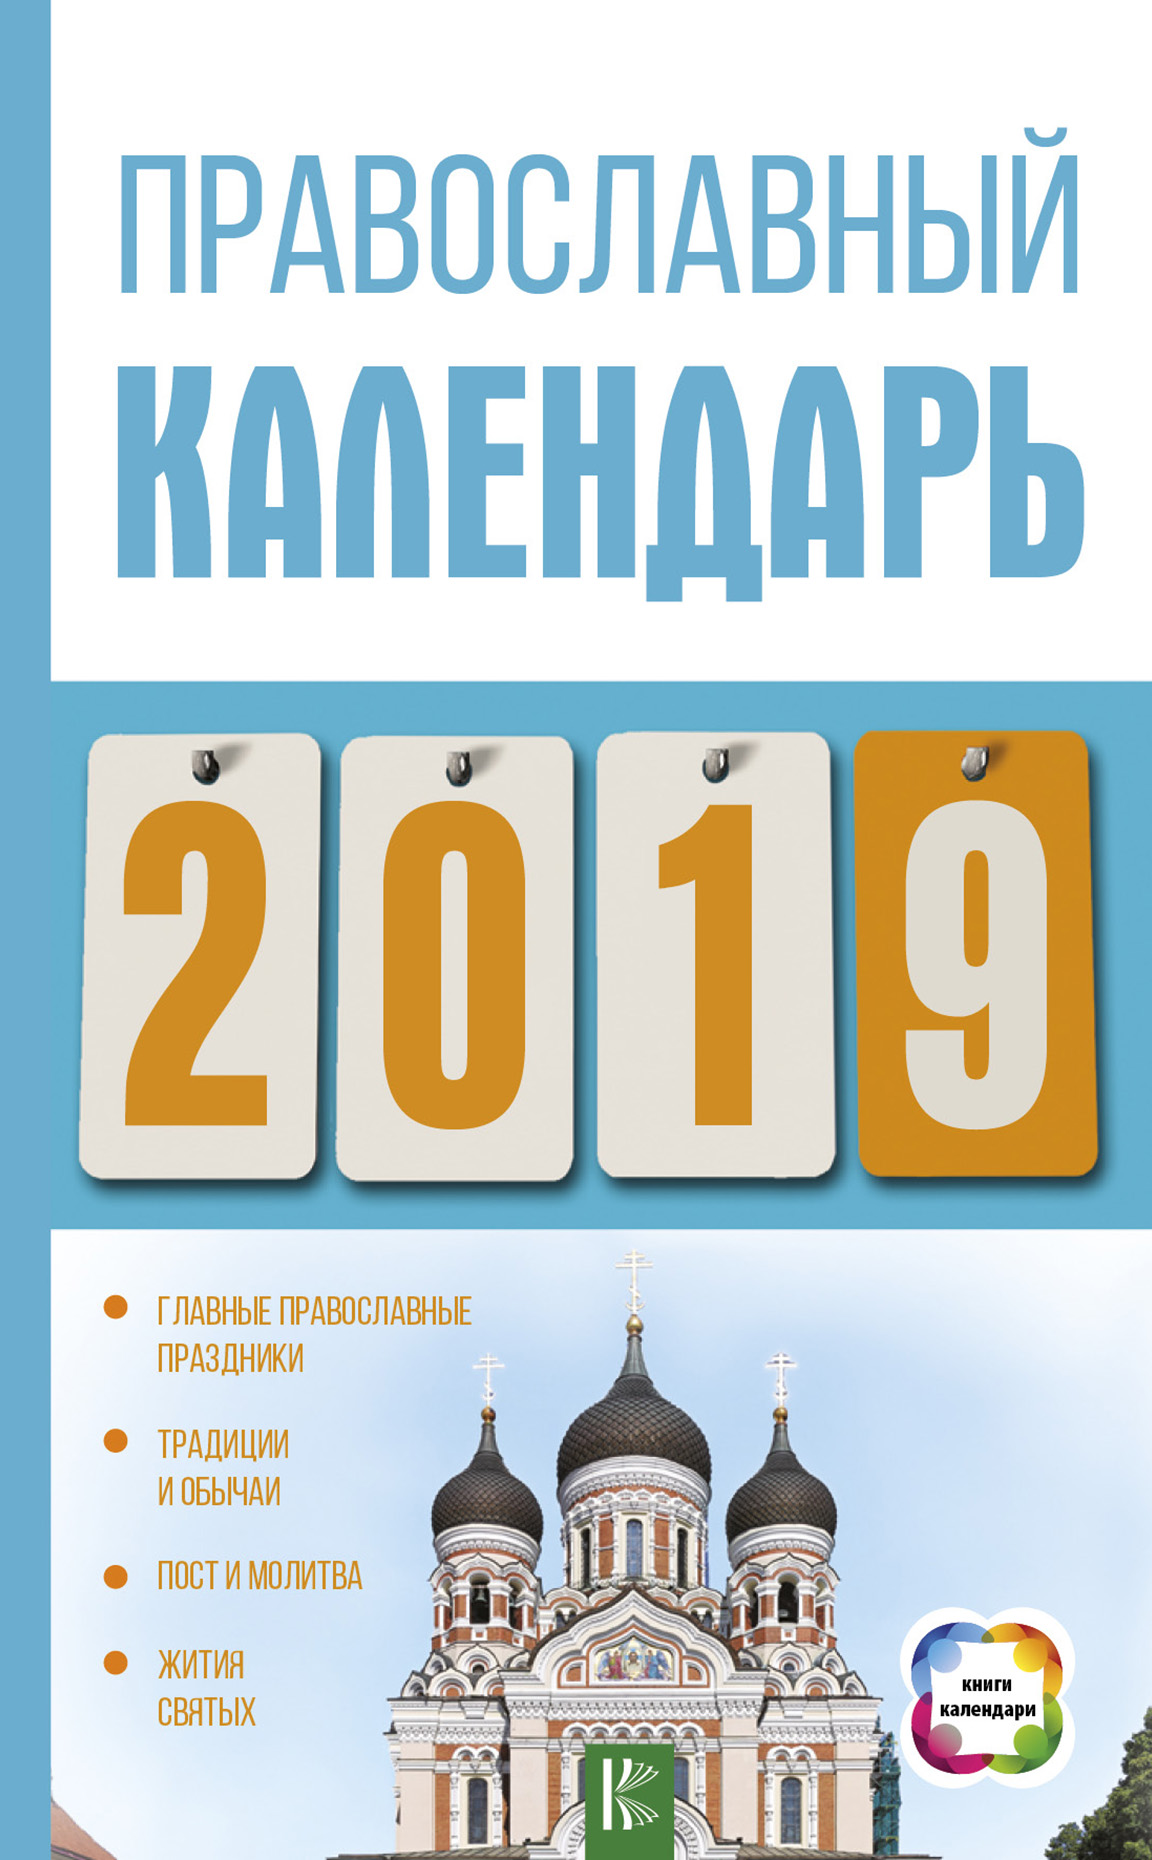 Диана Хорсанд-Мавроматис Православный календарь на 2019 год калинина м календарь православных праздников на 2016 год